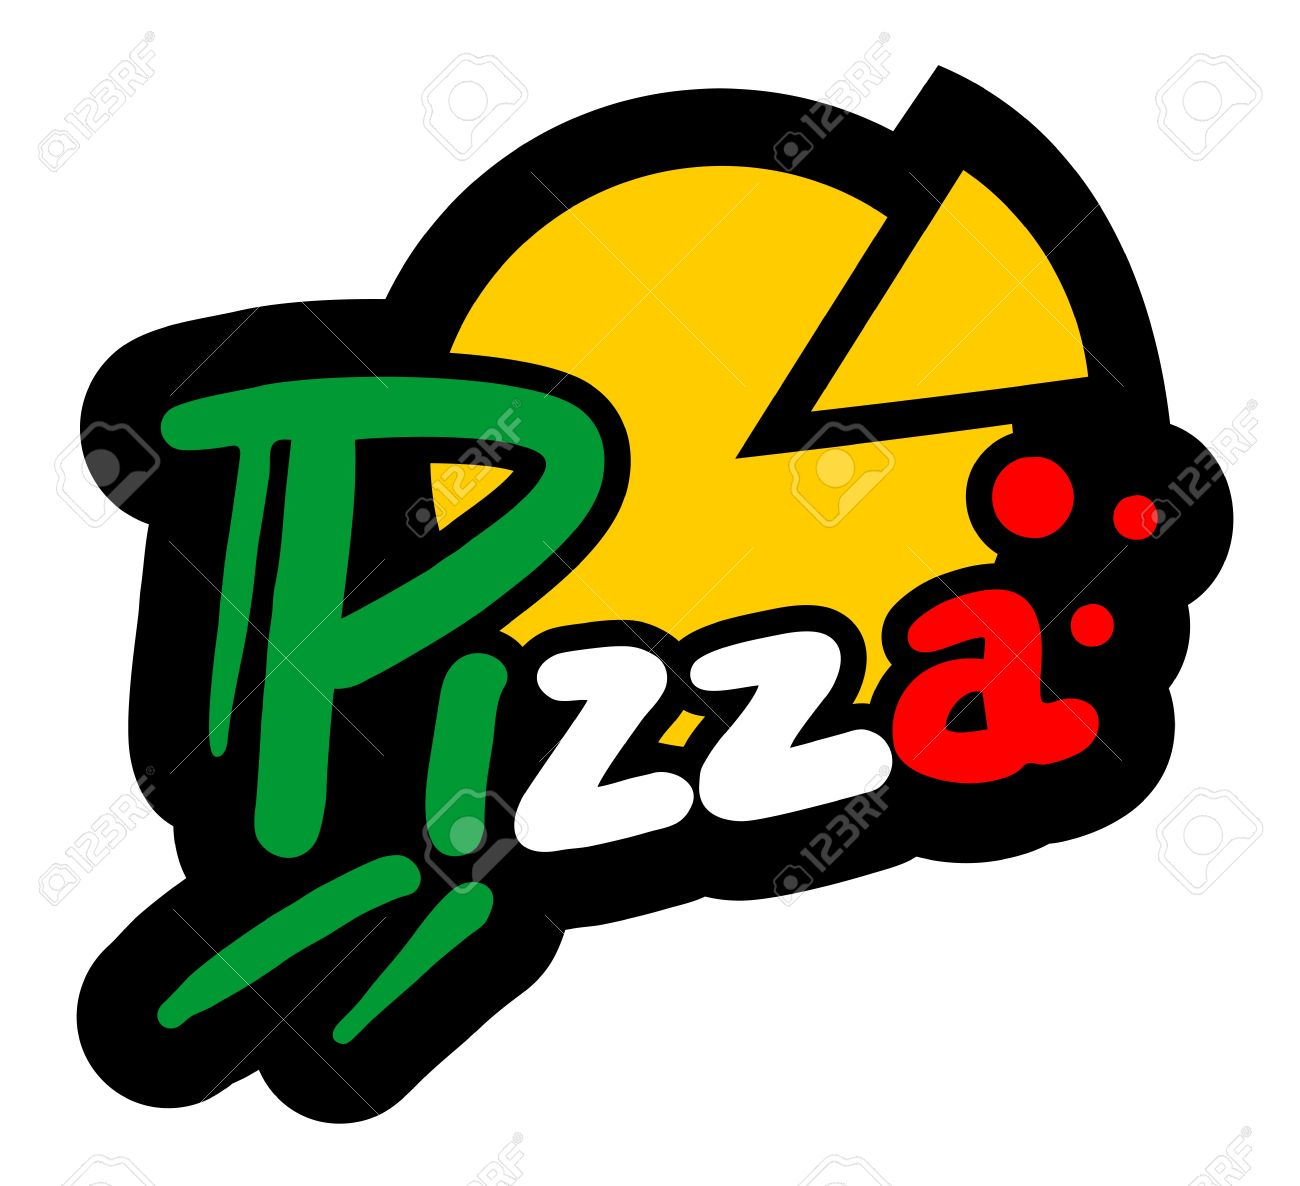 Pizza icon Stock Vector - 15885017